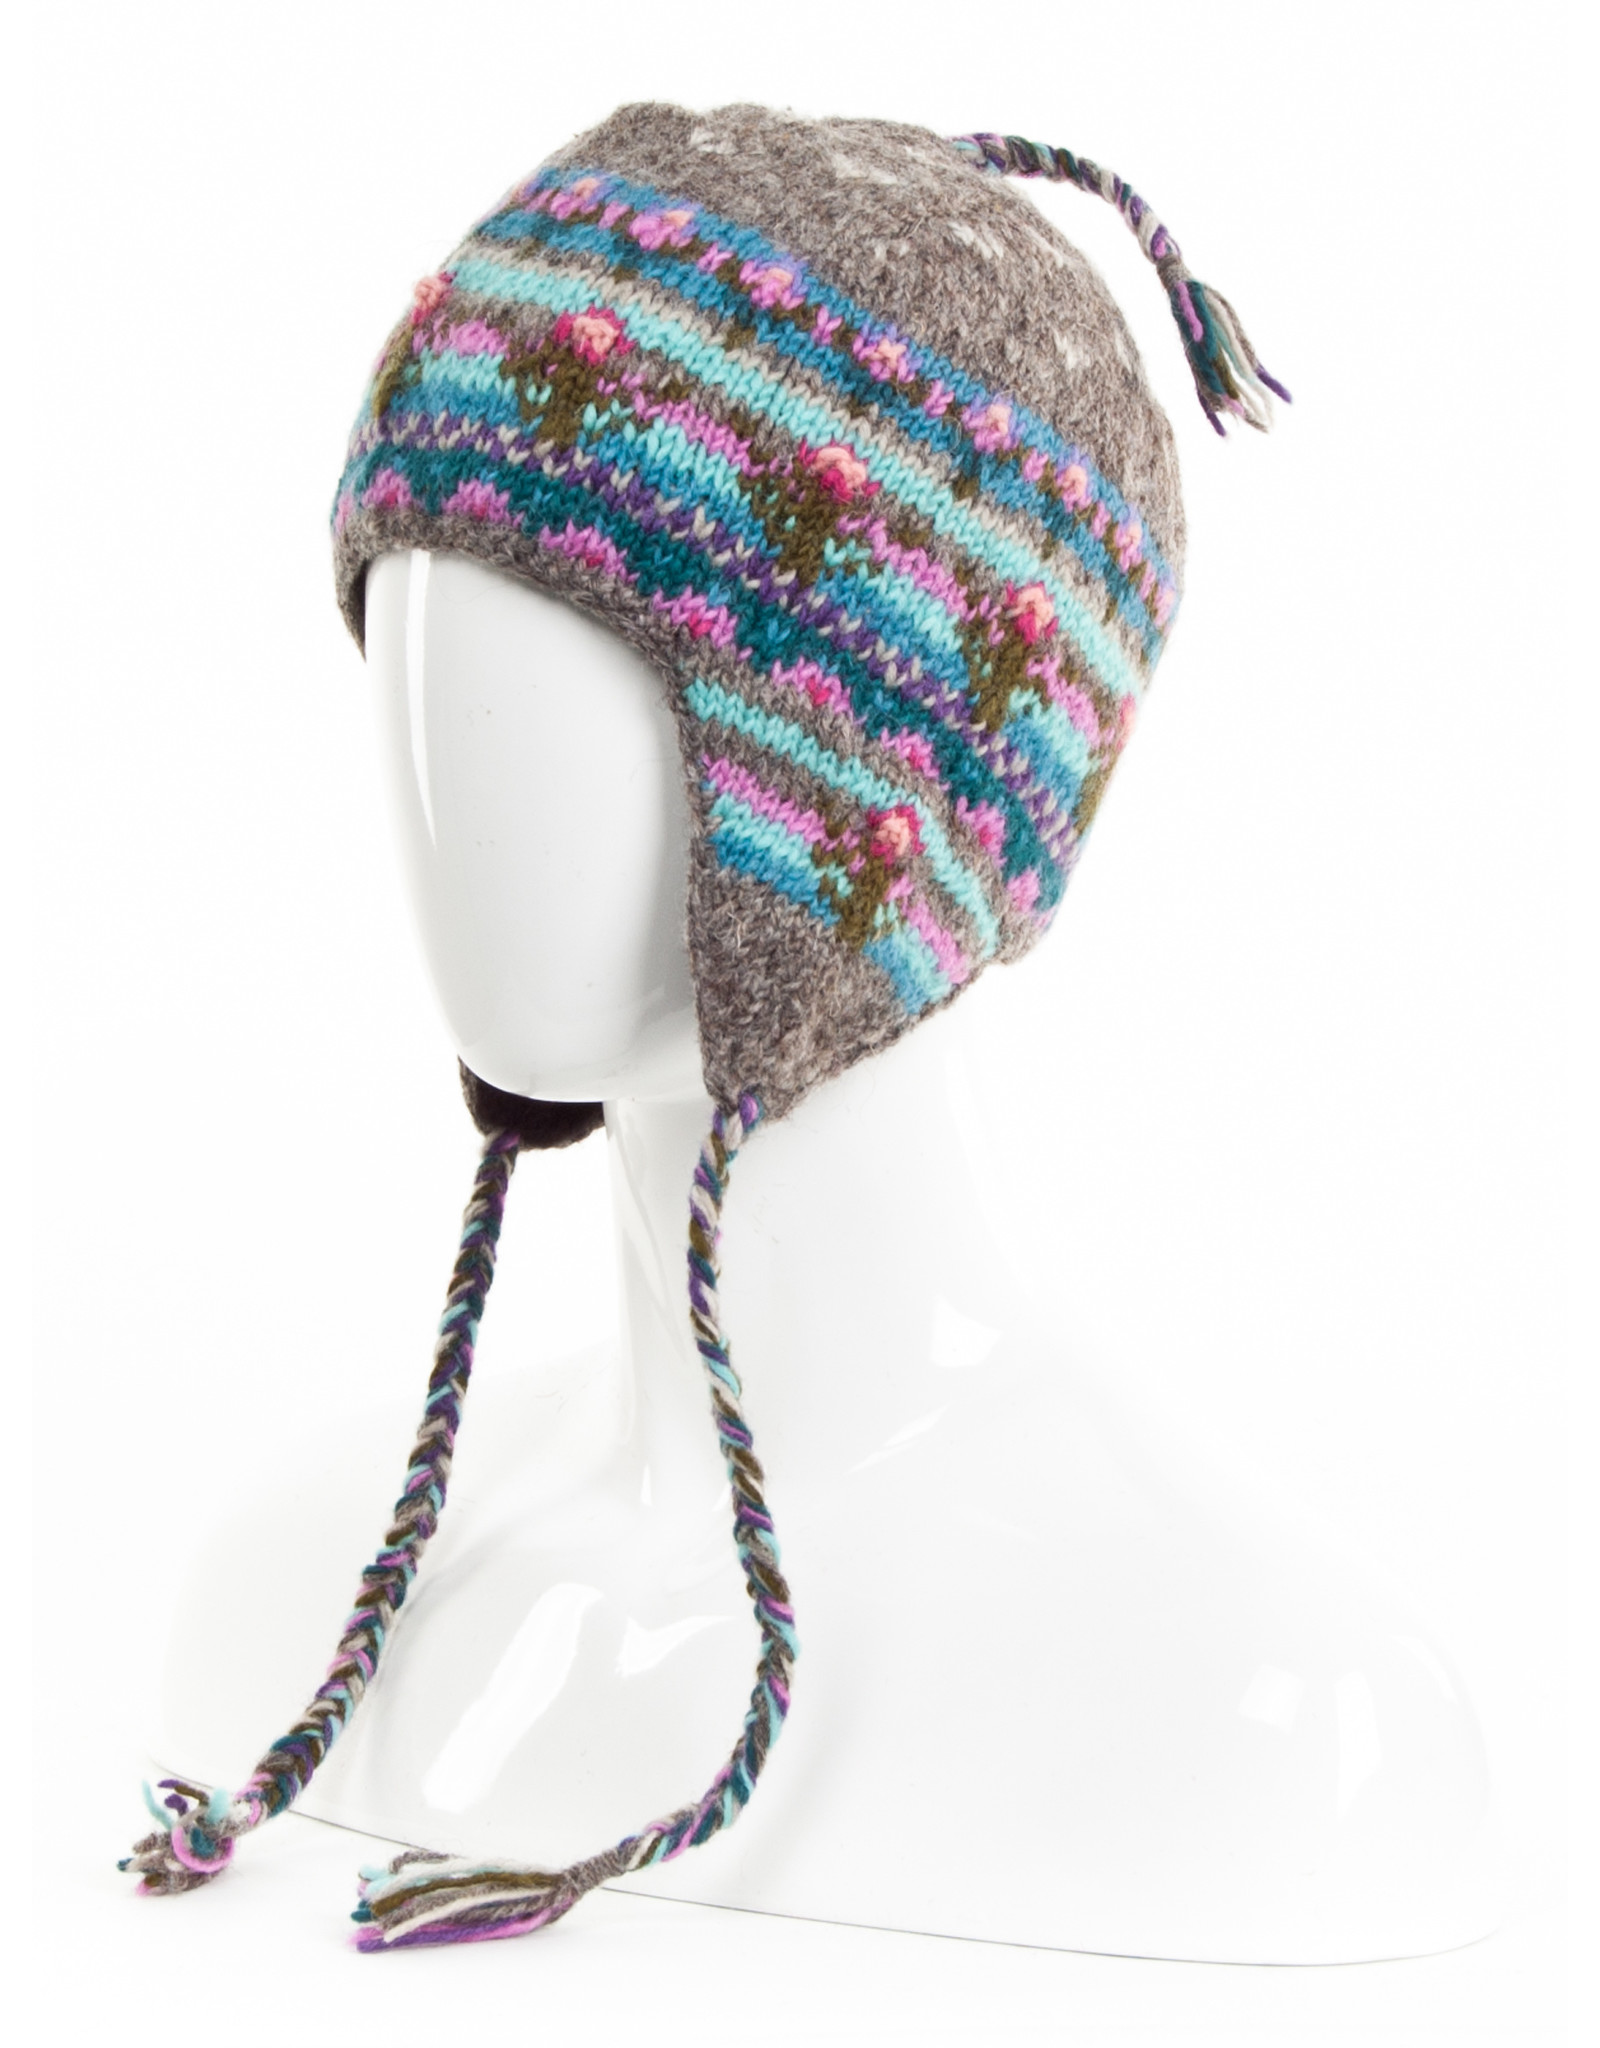 Lost Horizons Galena Knit Earflap hat, Nepal.